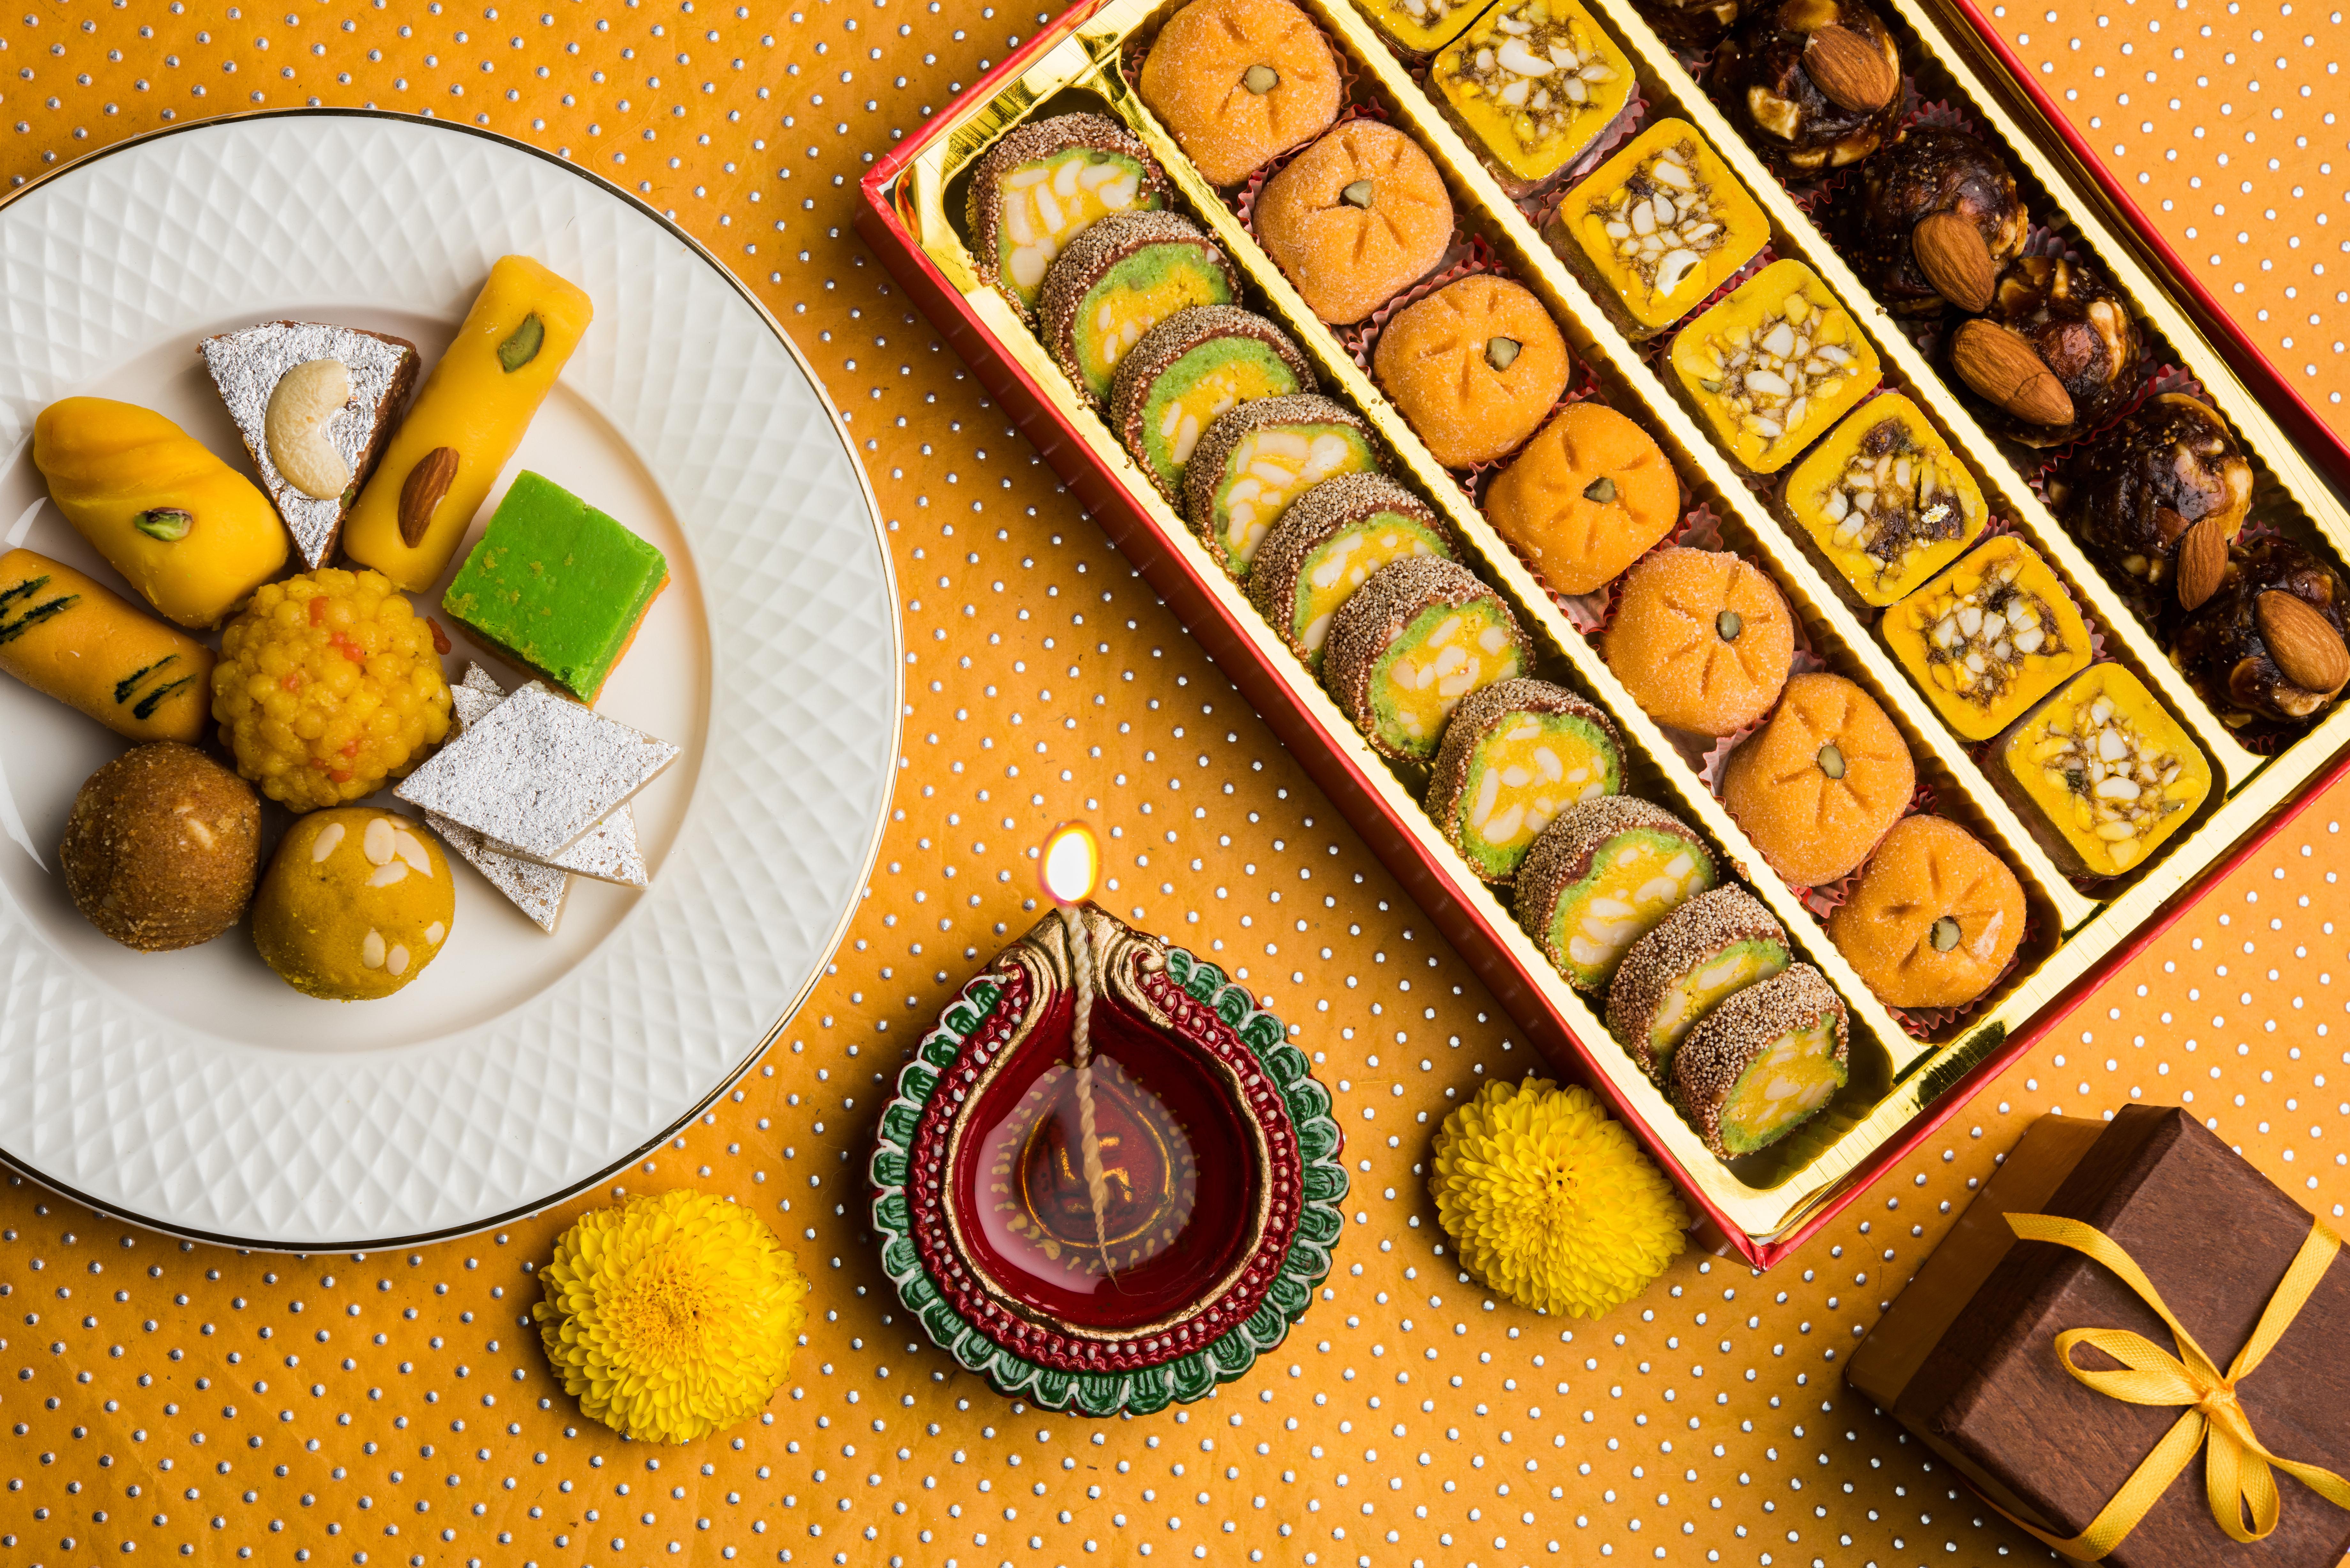 10 Diwali Mithai hampers to gift this season